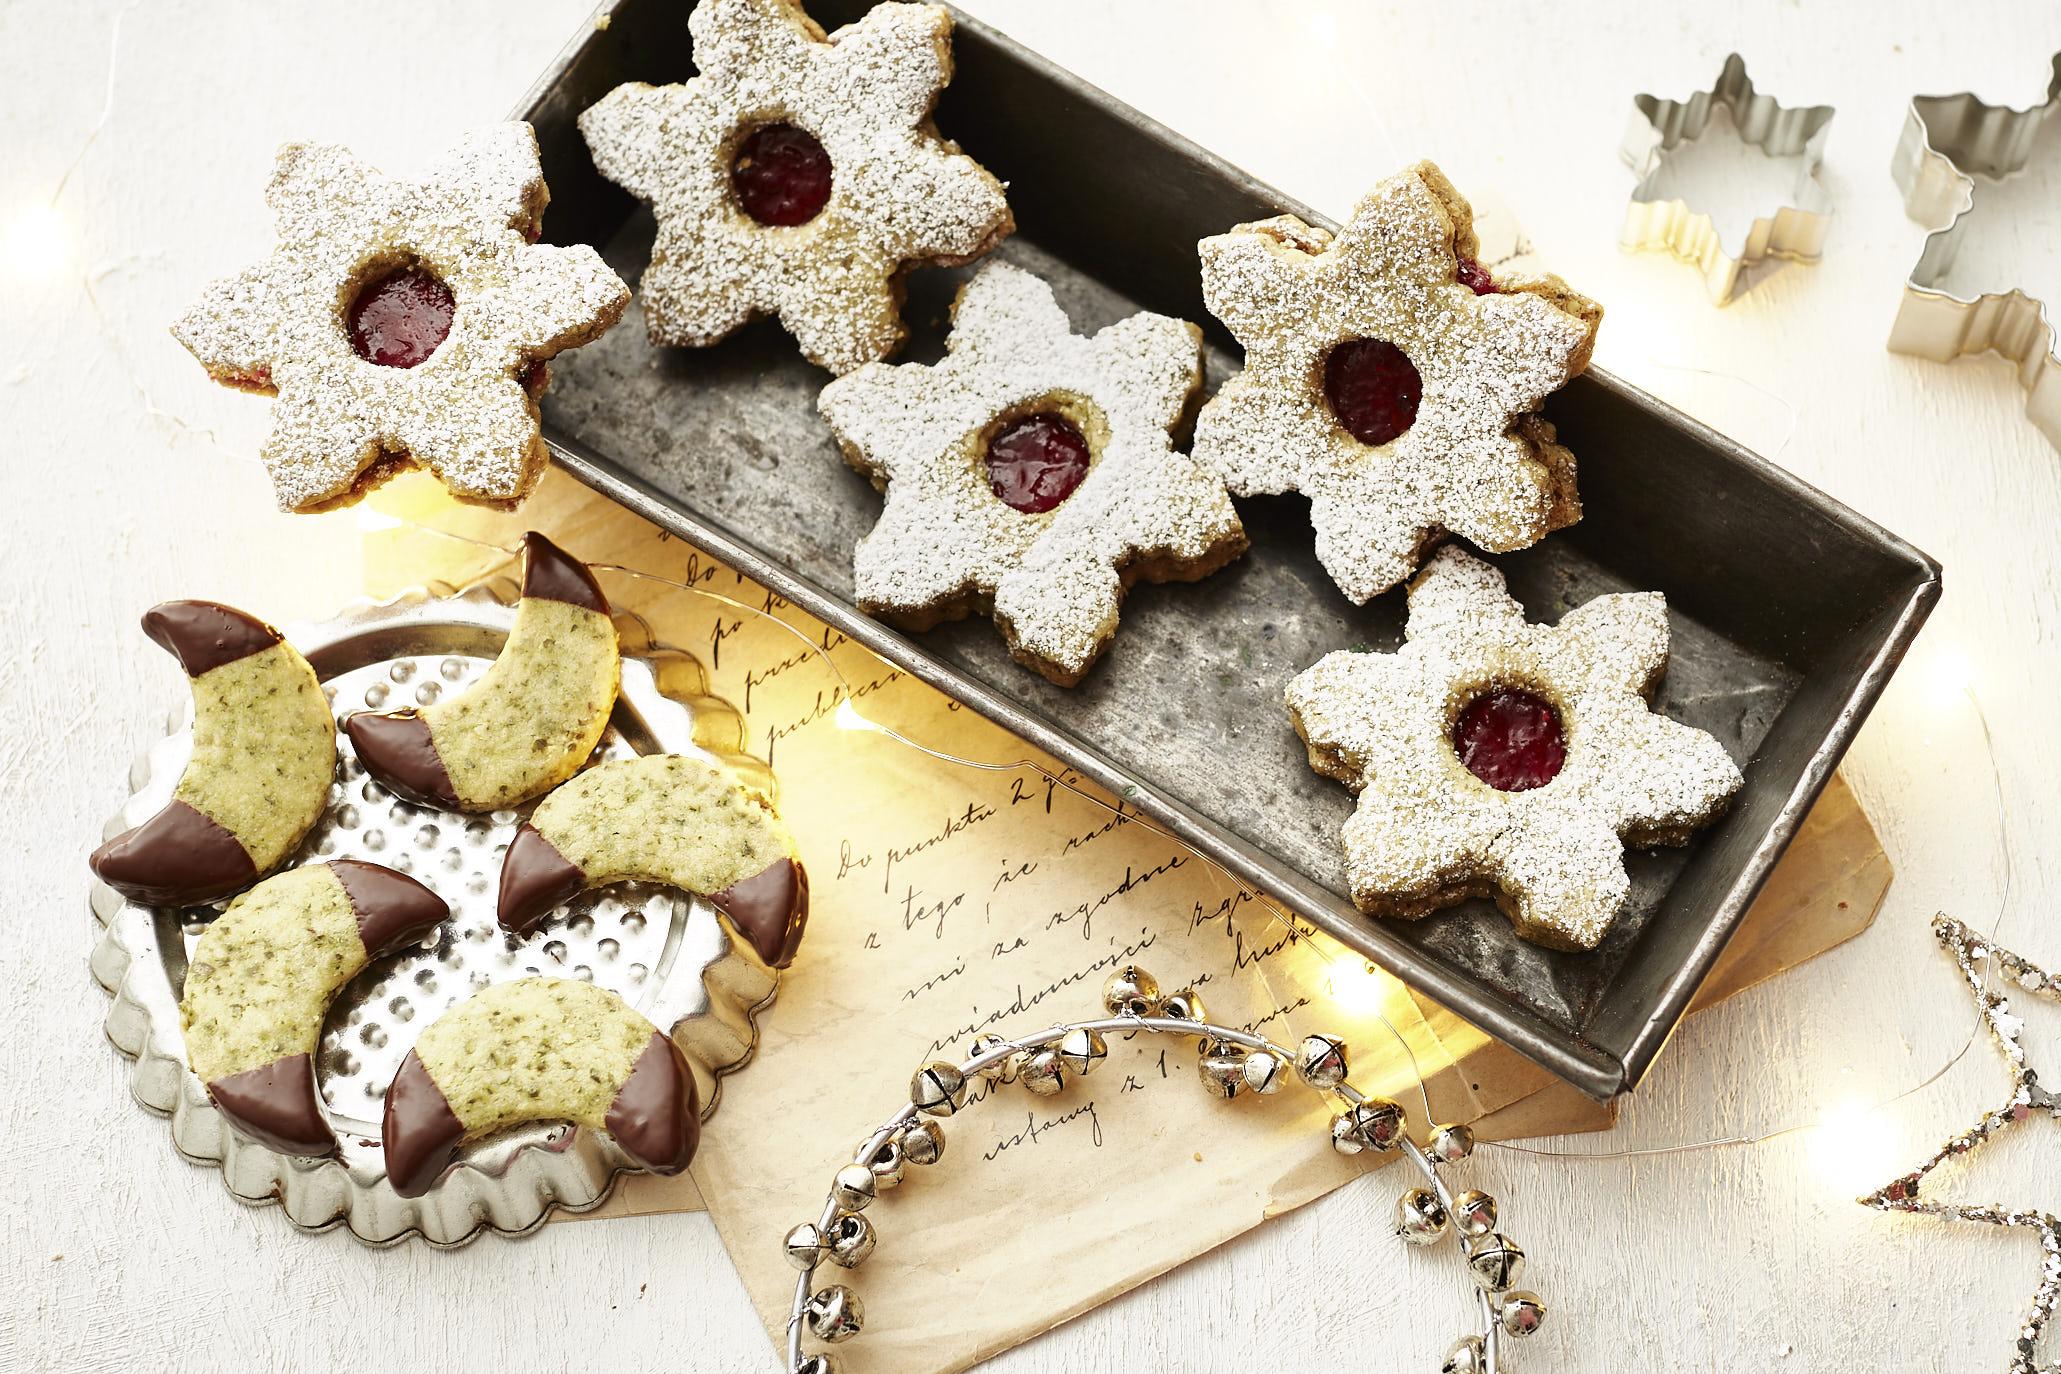 kürbiskern-matcha-pistazien-kekse- 8